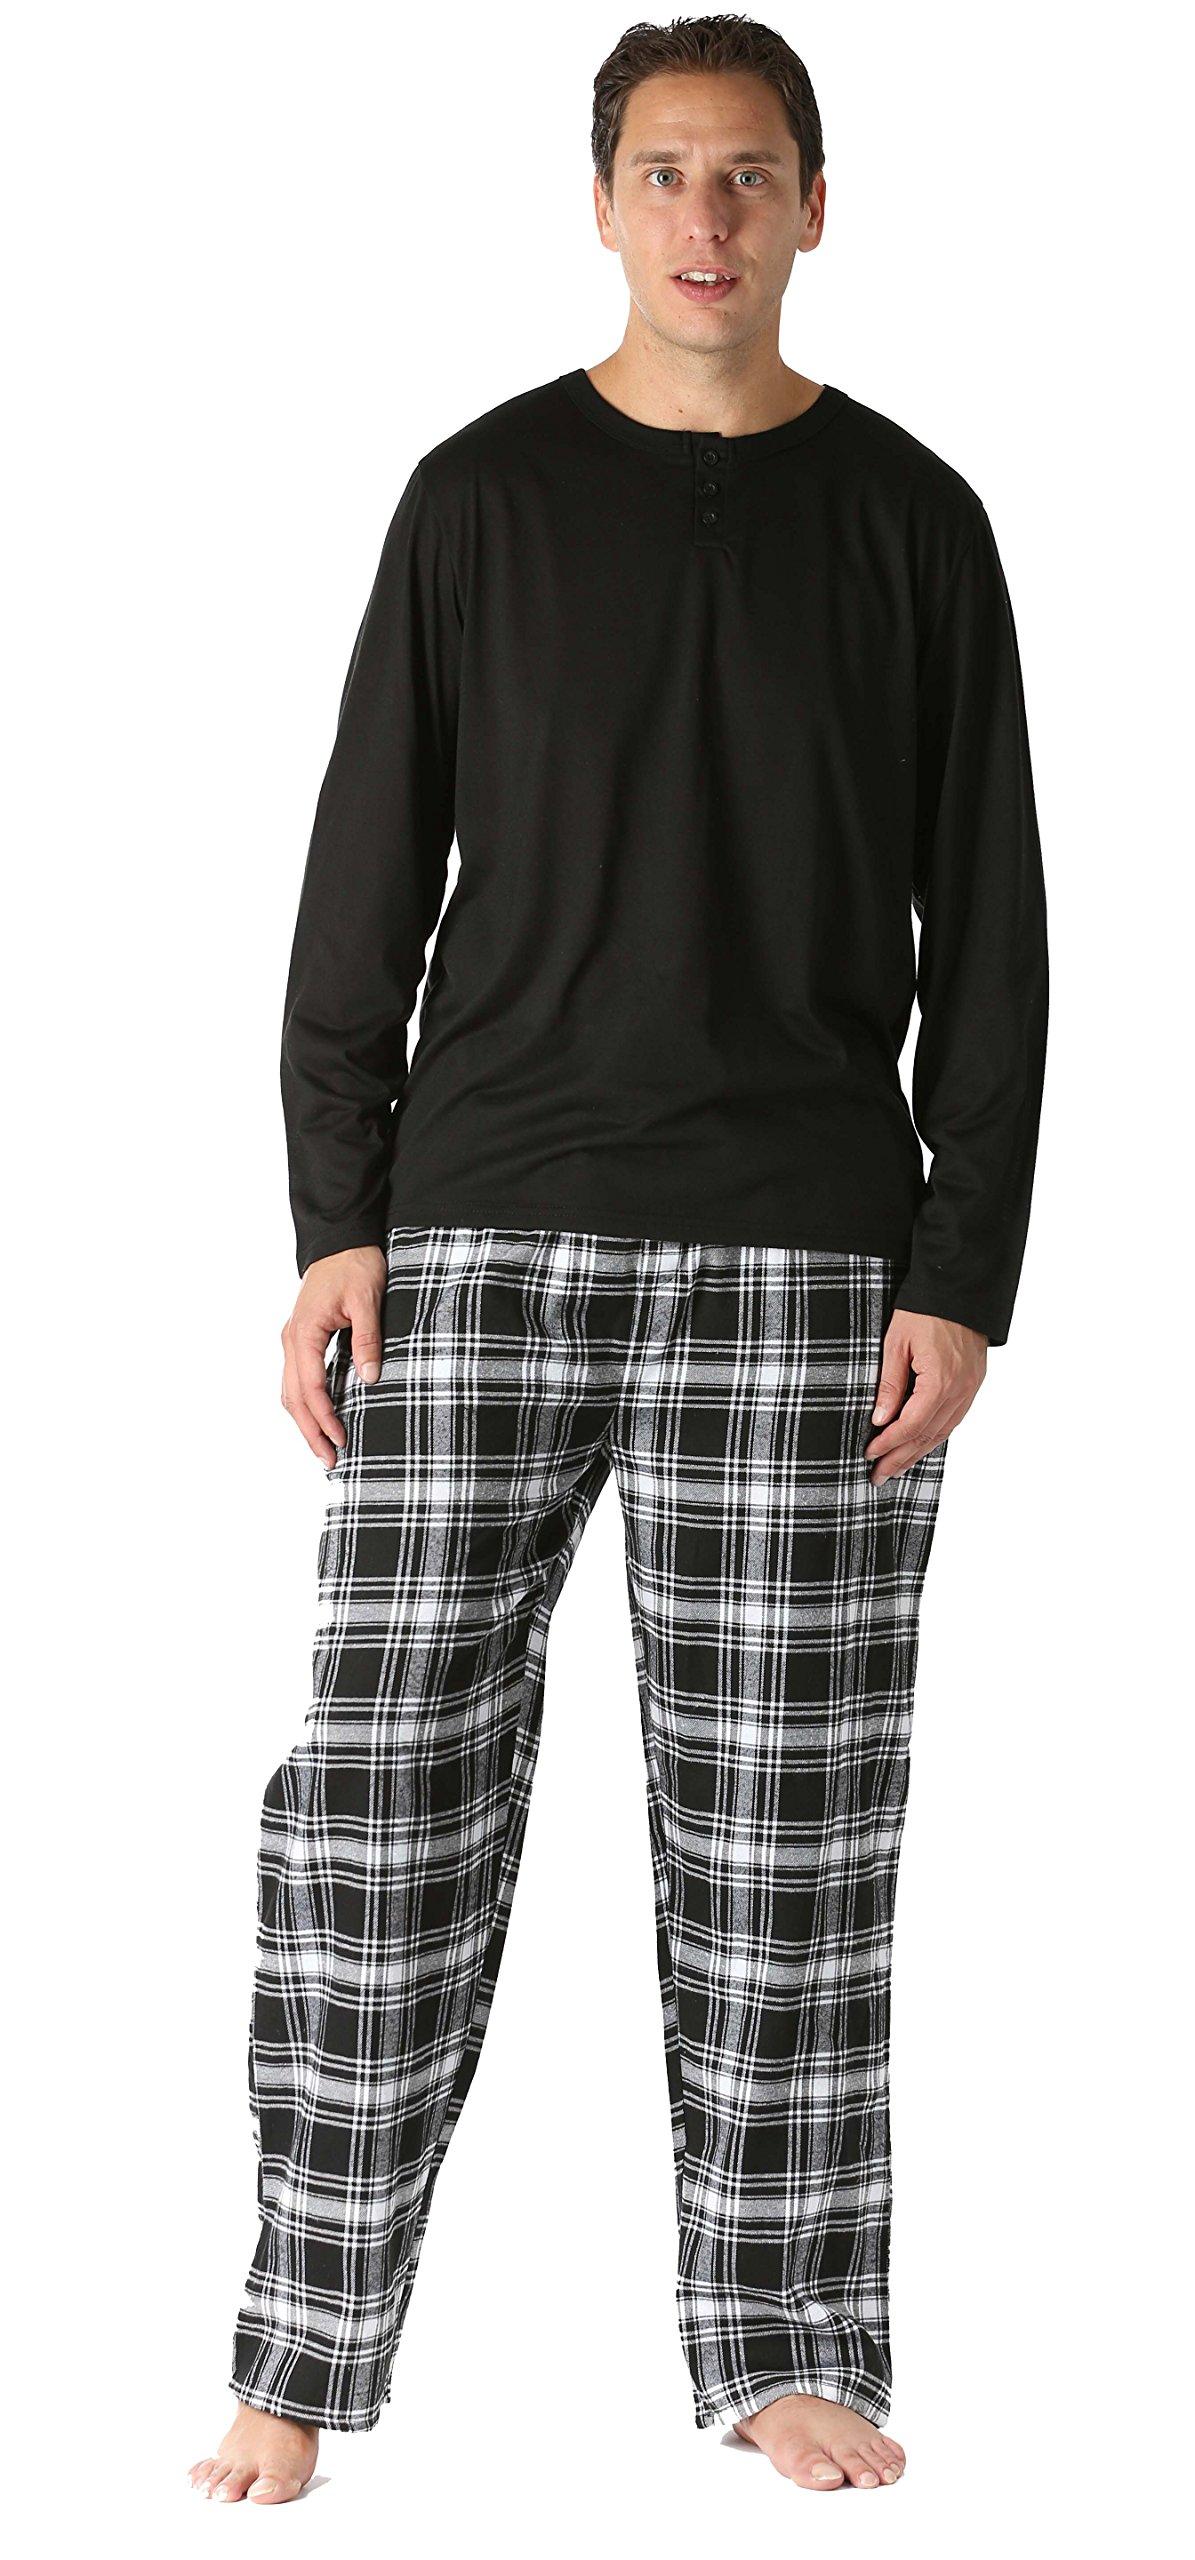 #FollowMe 44911-7-XXL Pajama Pants Set For Men/Sleepwear/PJS